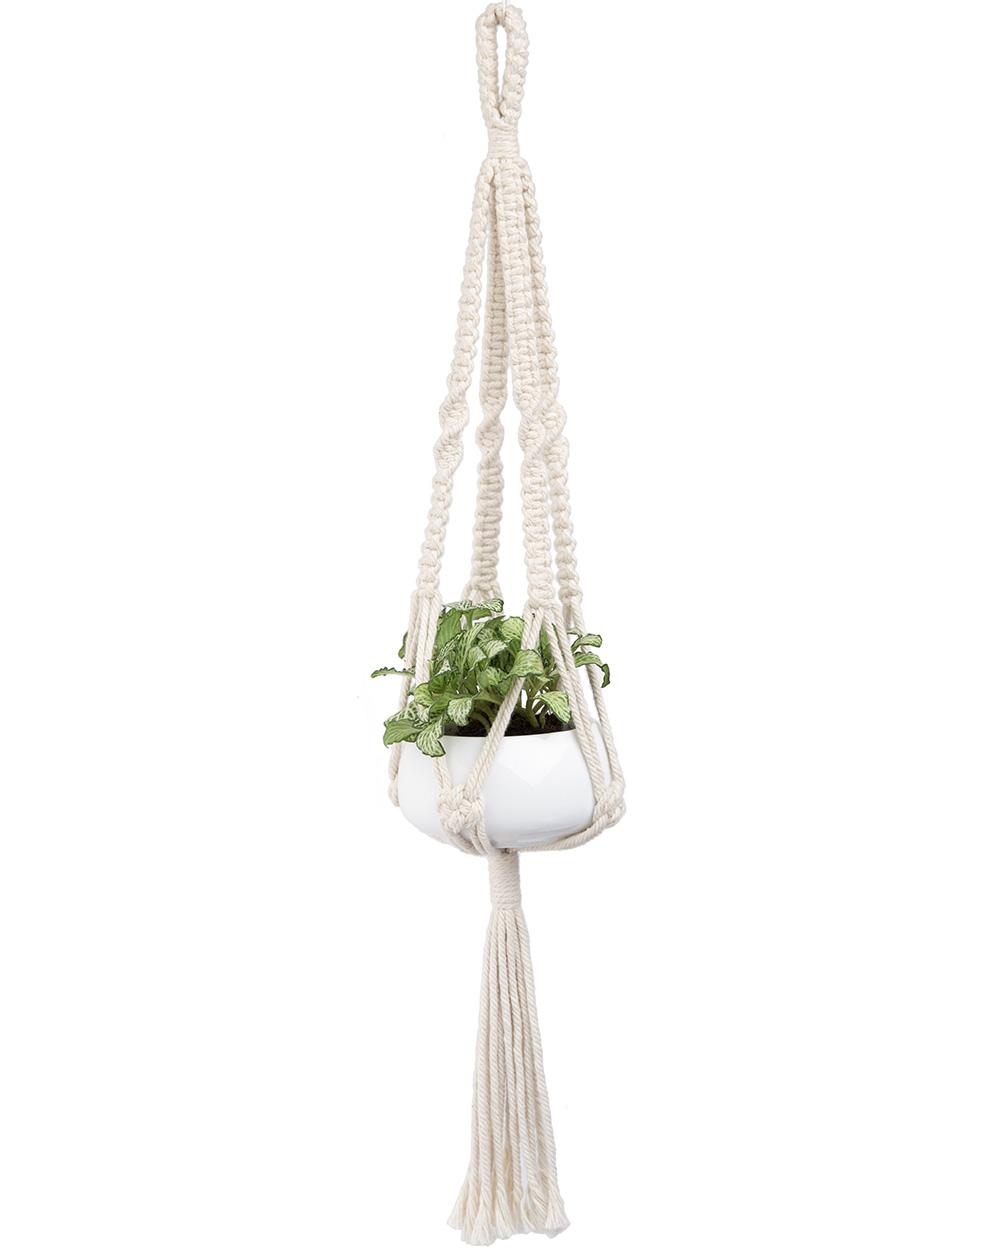 Mkono Mini Macrame Plant Hanger Hanging Planter Basket